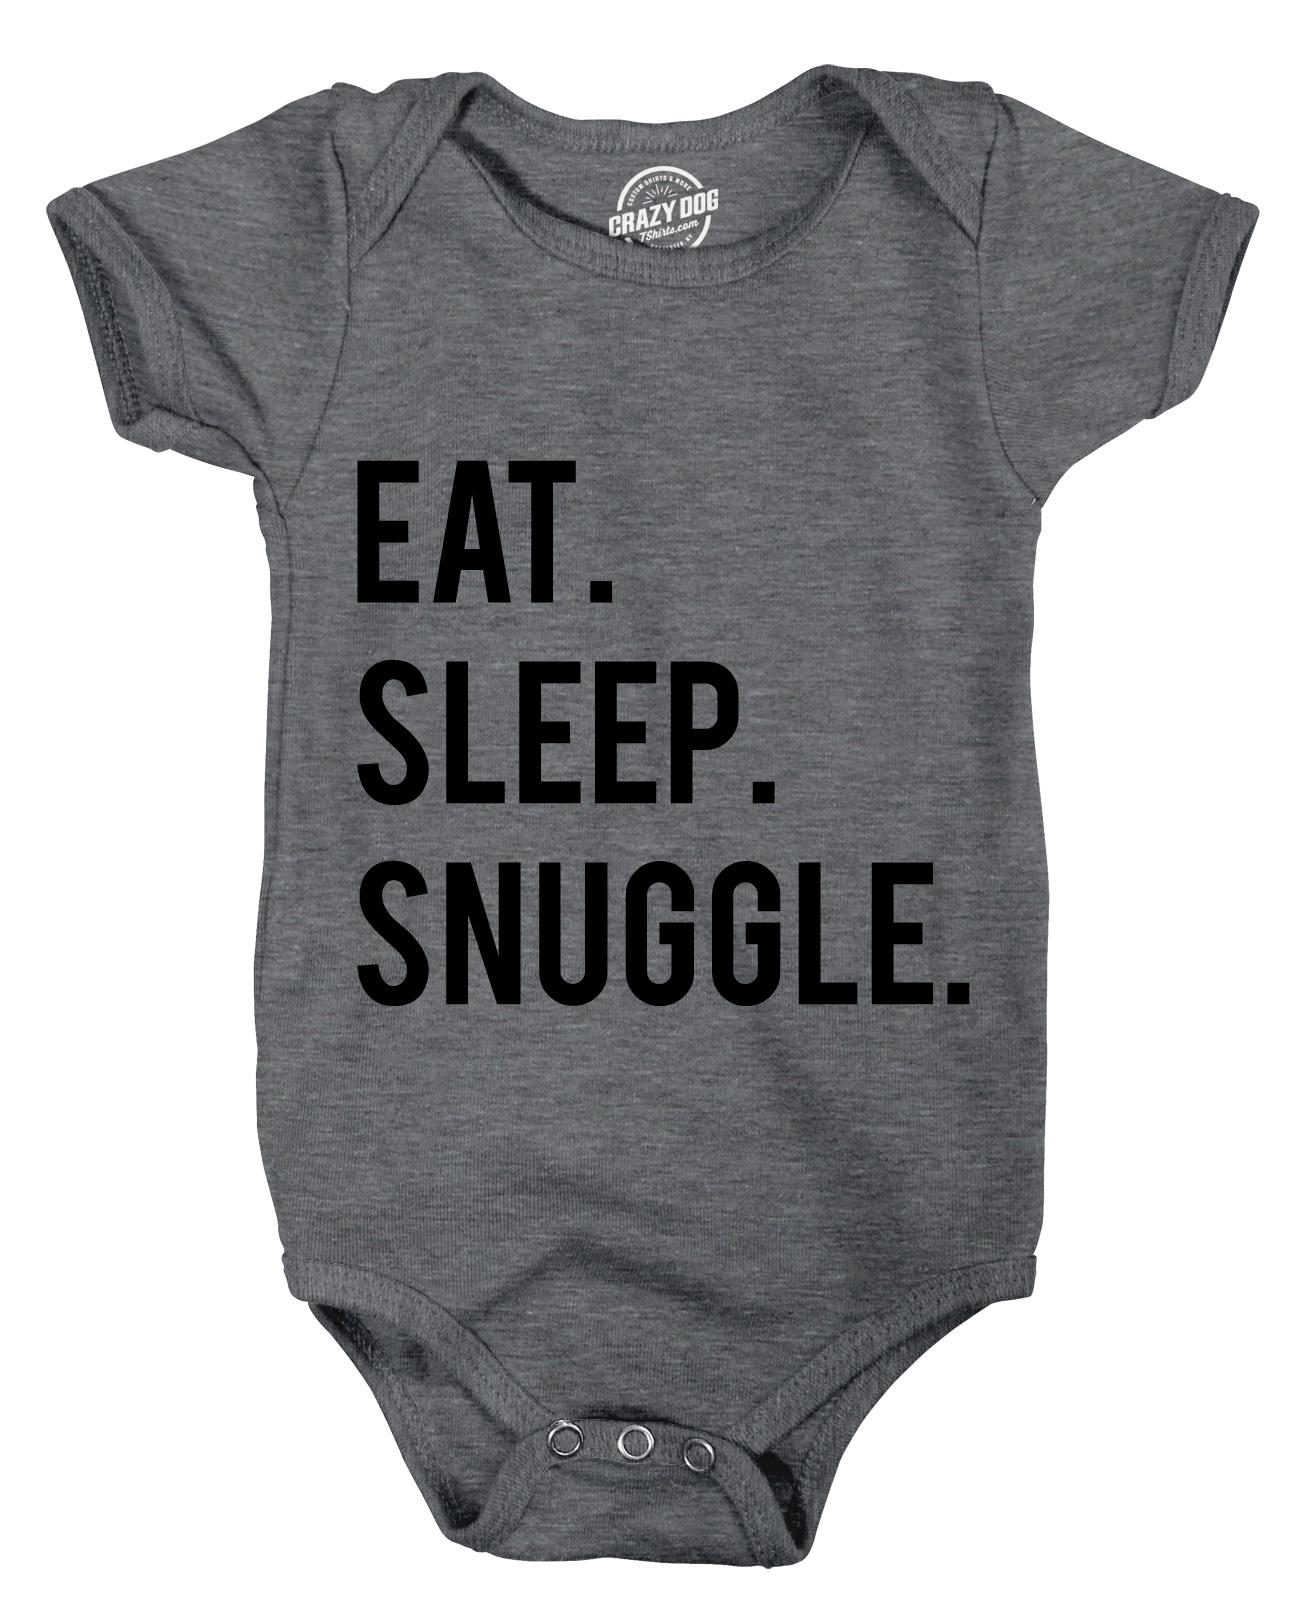 Creeper Eat Sleep Snuggle Baby Bodysuit Adorable Infant Lifestyle Jumpsuit